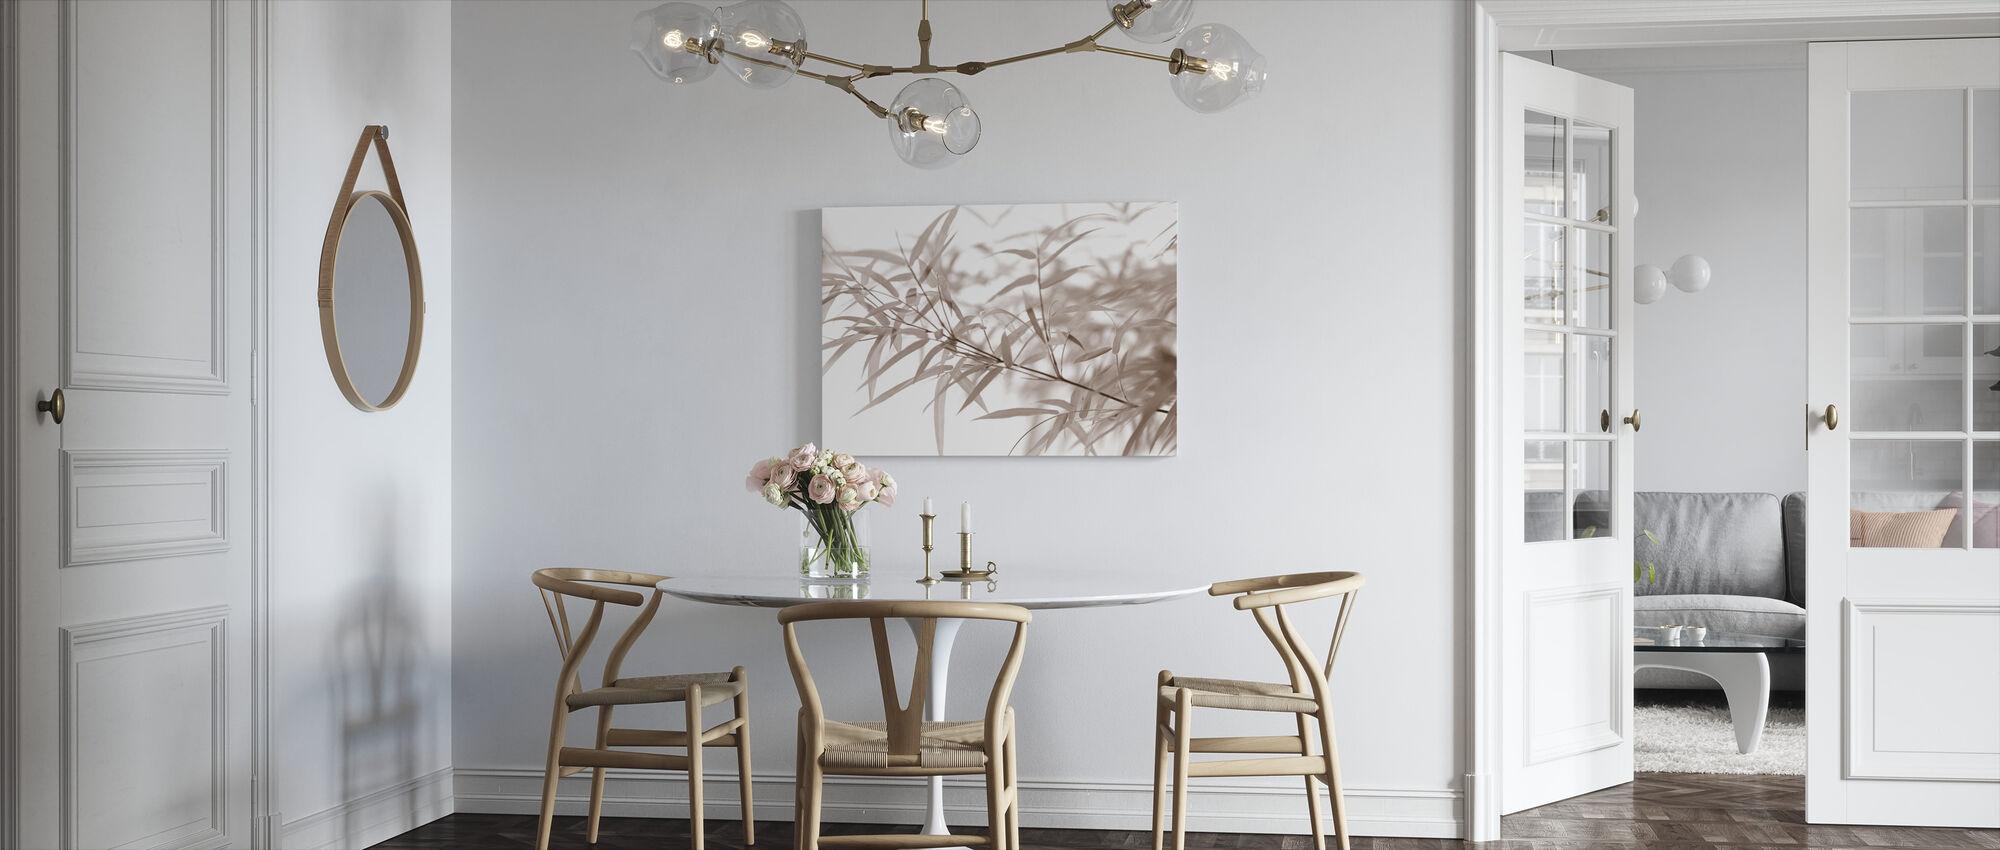 Miniatyyri Bambu - Sepia - Canvastaulu - Keittiö